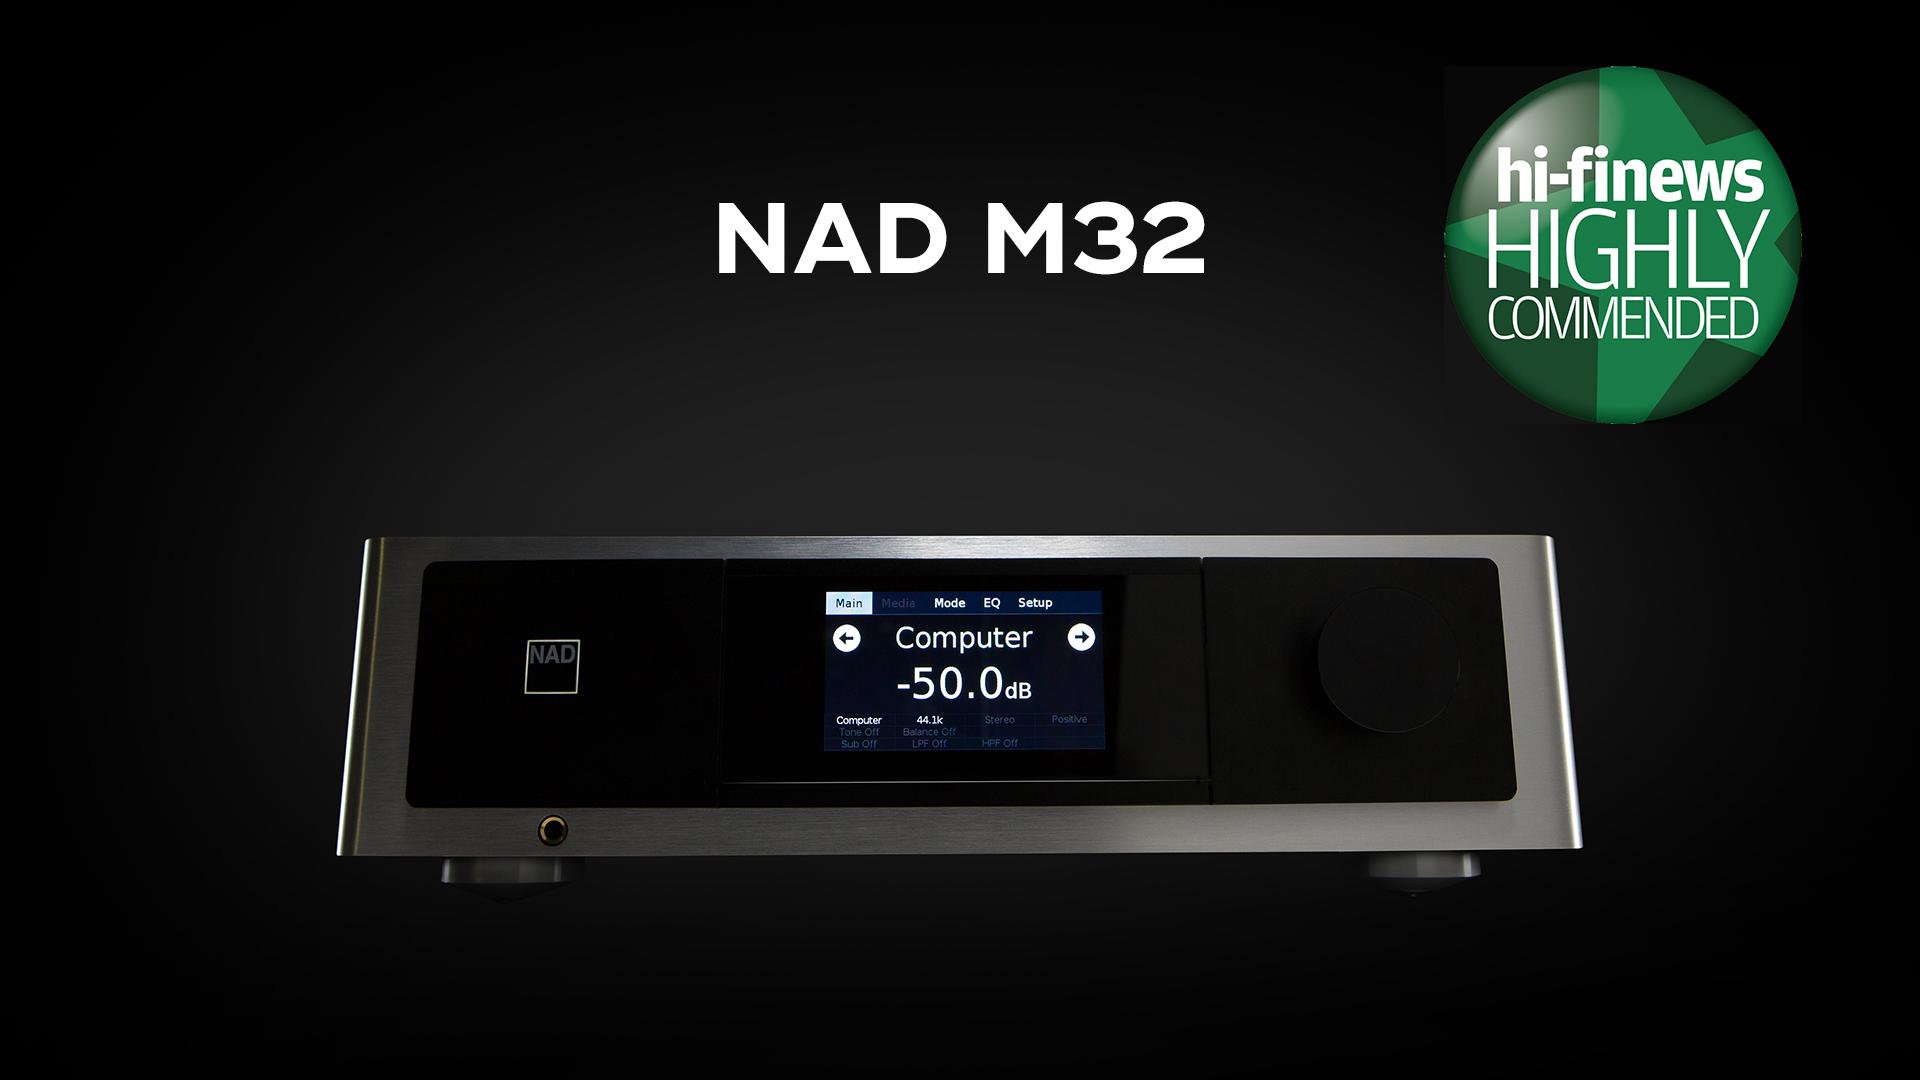 NAD M32 Award HiFi News